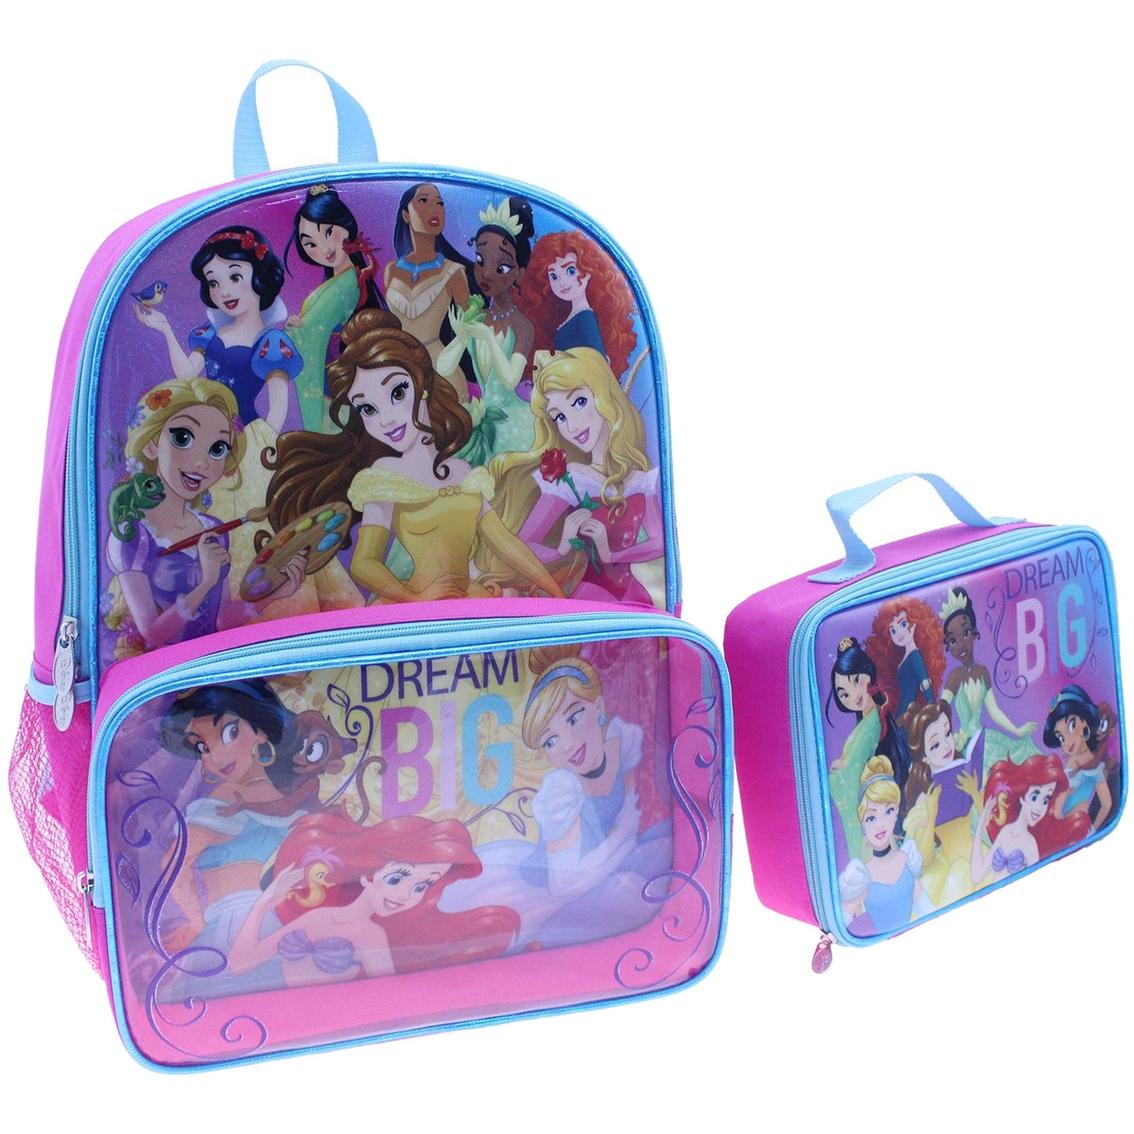 Disney Princess Girls Dream Big Backpack Kids School Lunch Book Rucksack Zip